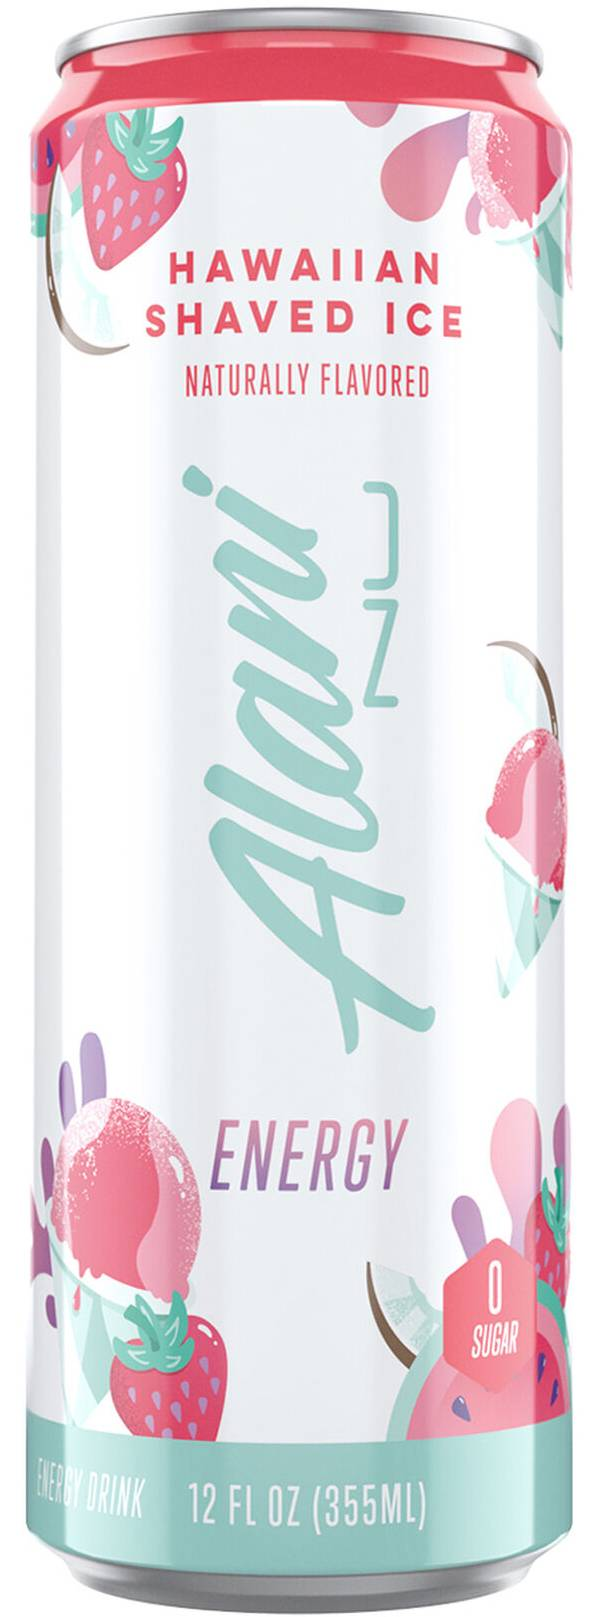 Alani Nu 12 oz. Energy Drink - Hawaiian Shaved Ice product image